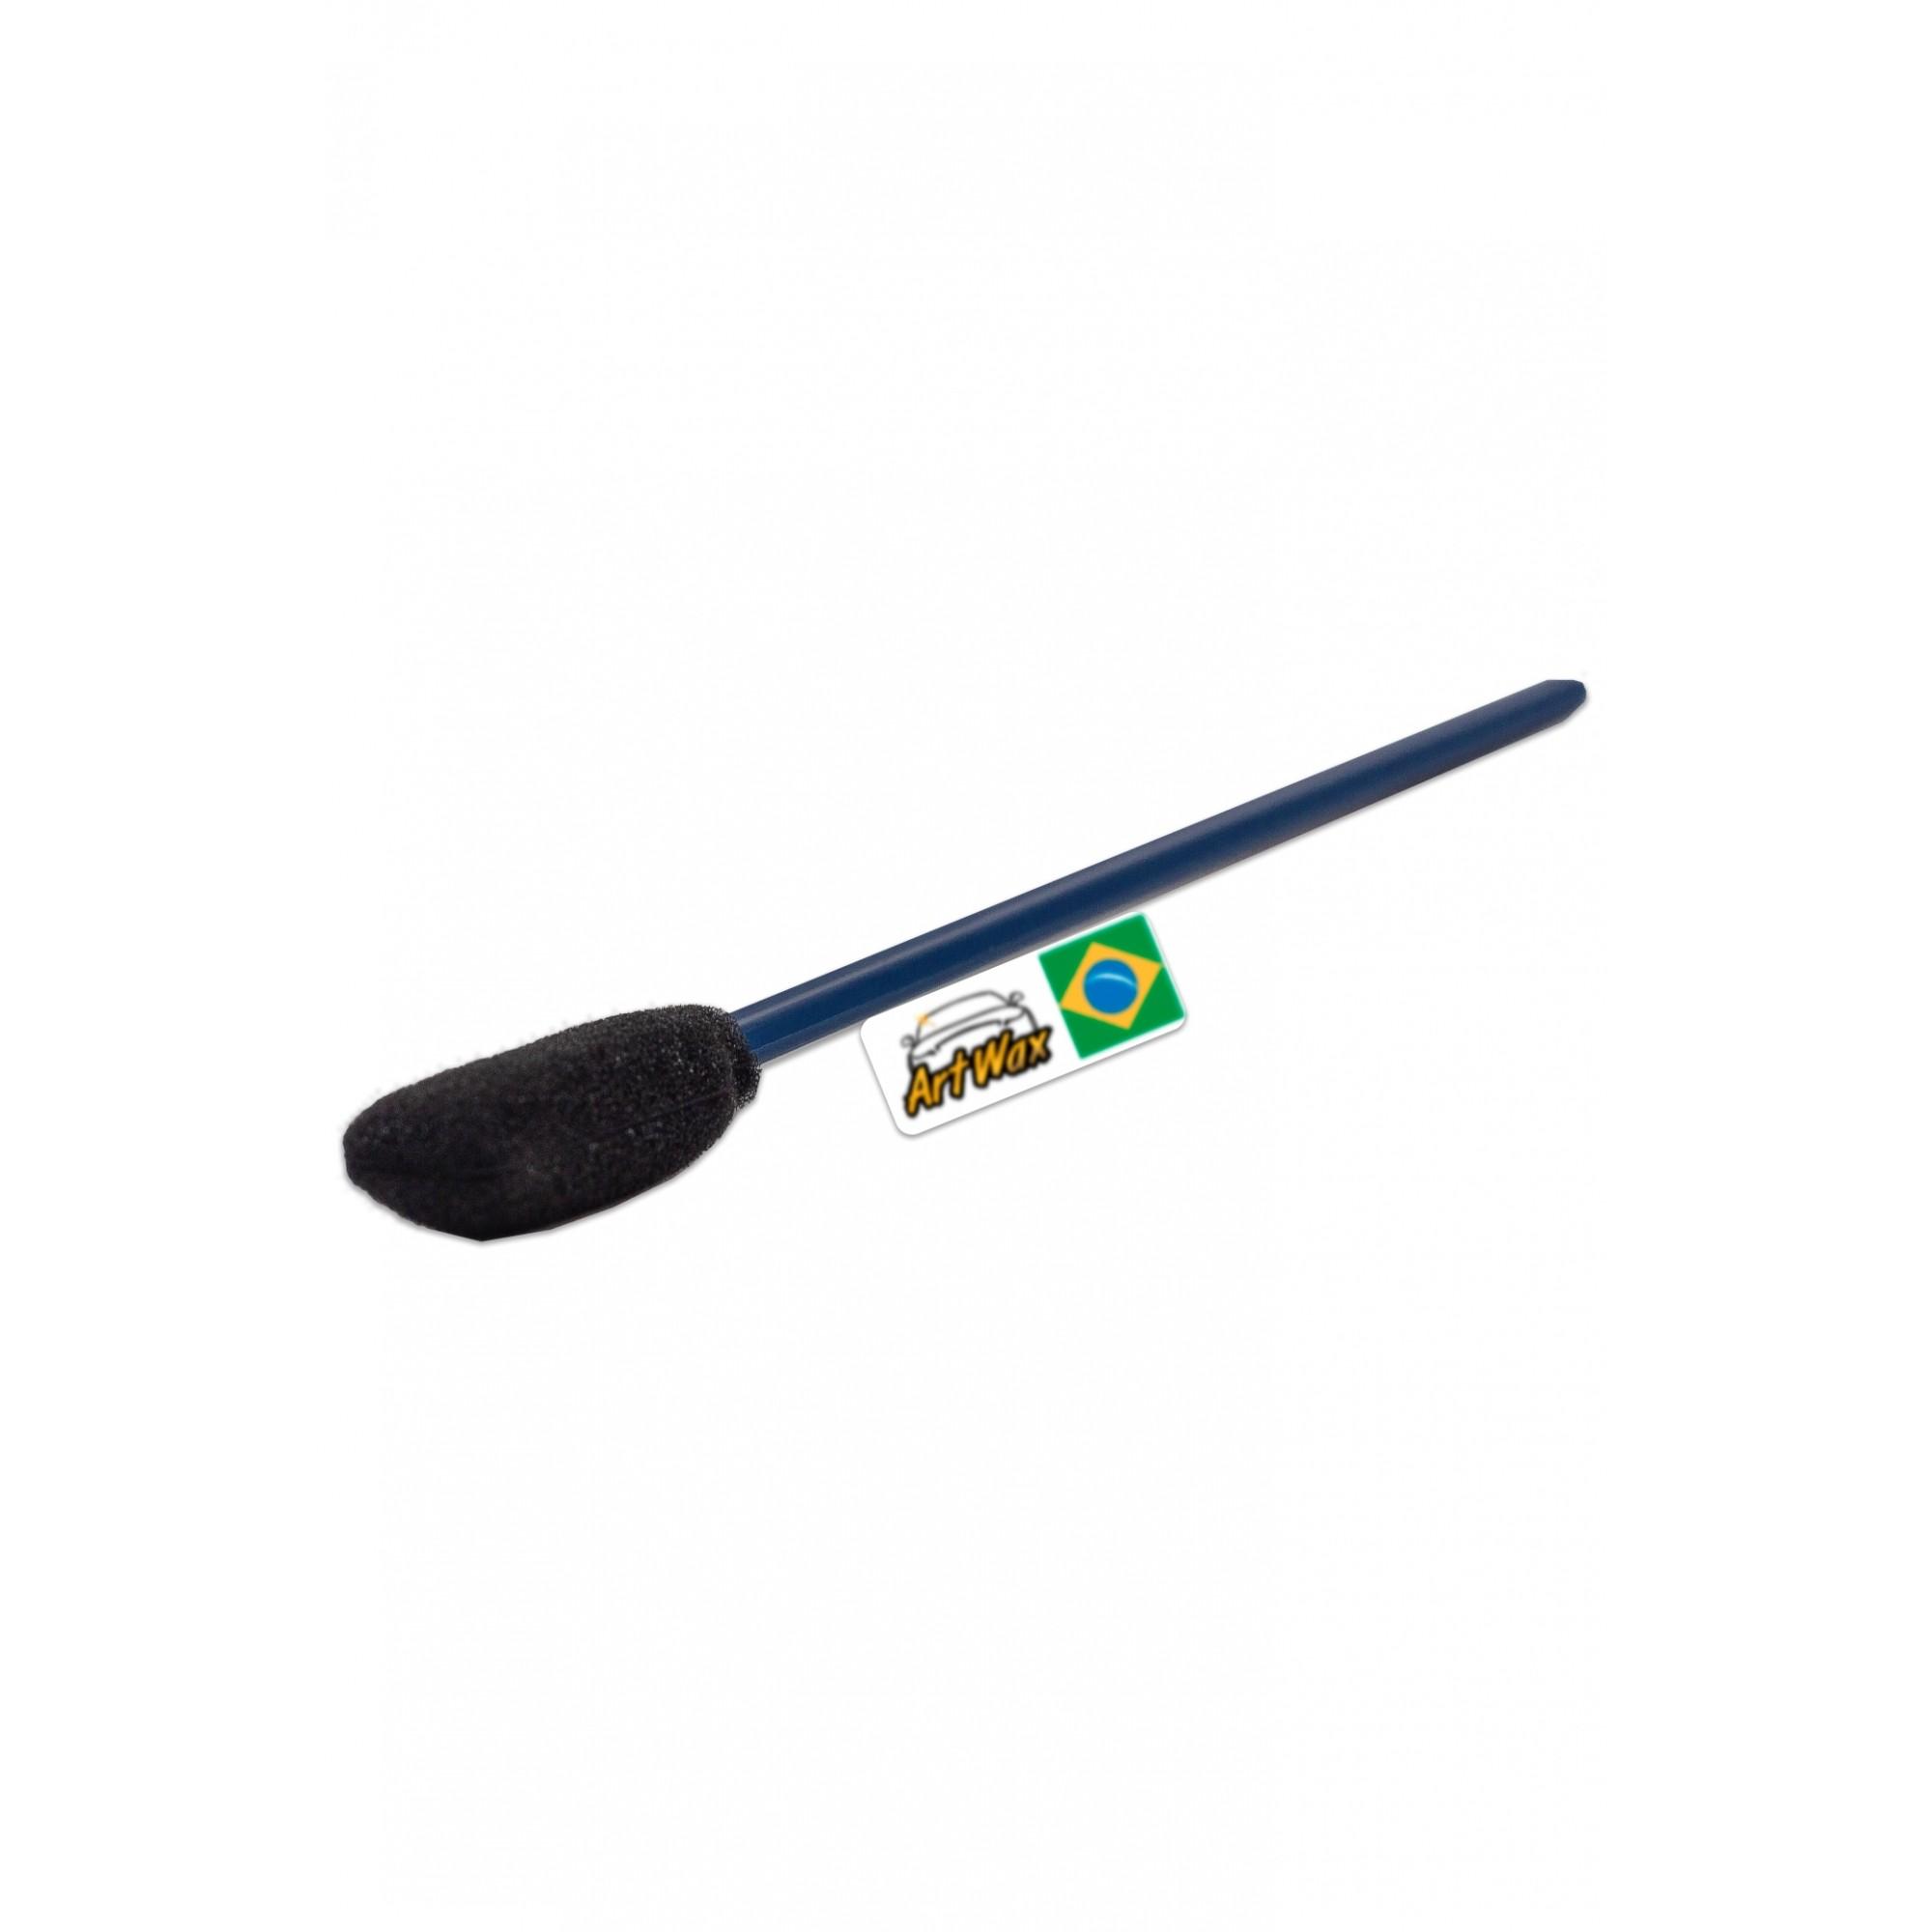 Mini Stick Médio Para Detalhamento Locais Pequenos Vonixx - 1un